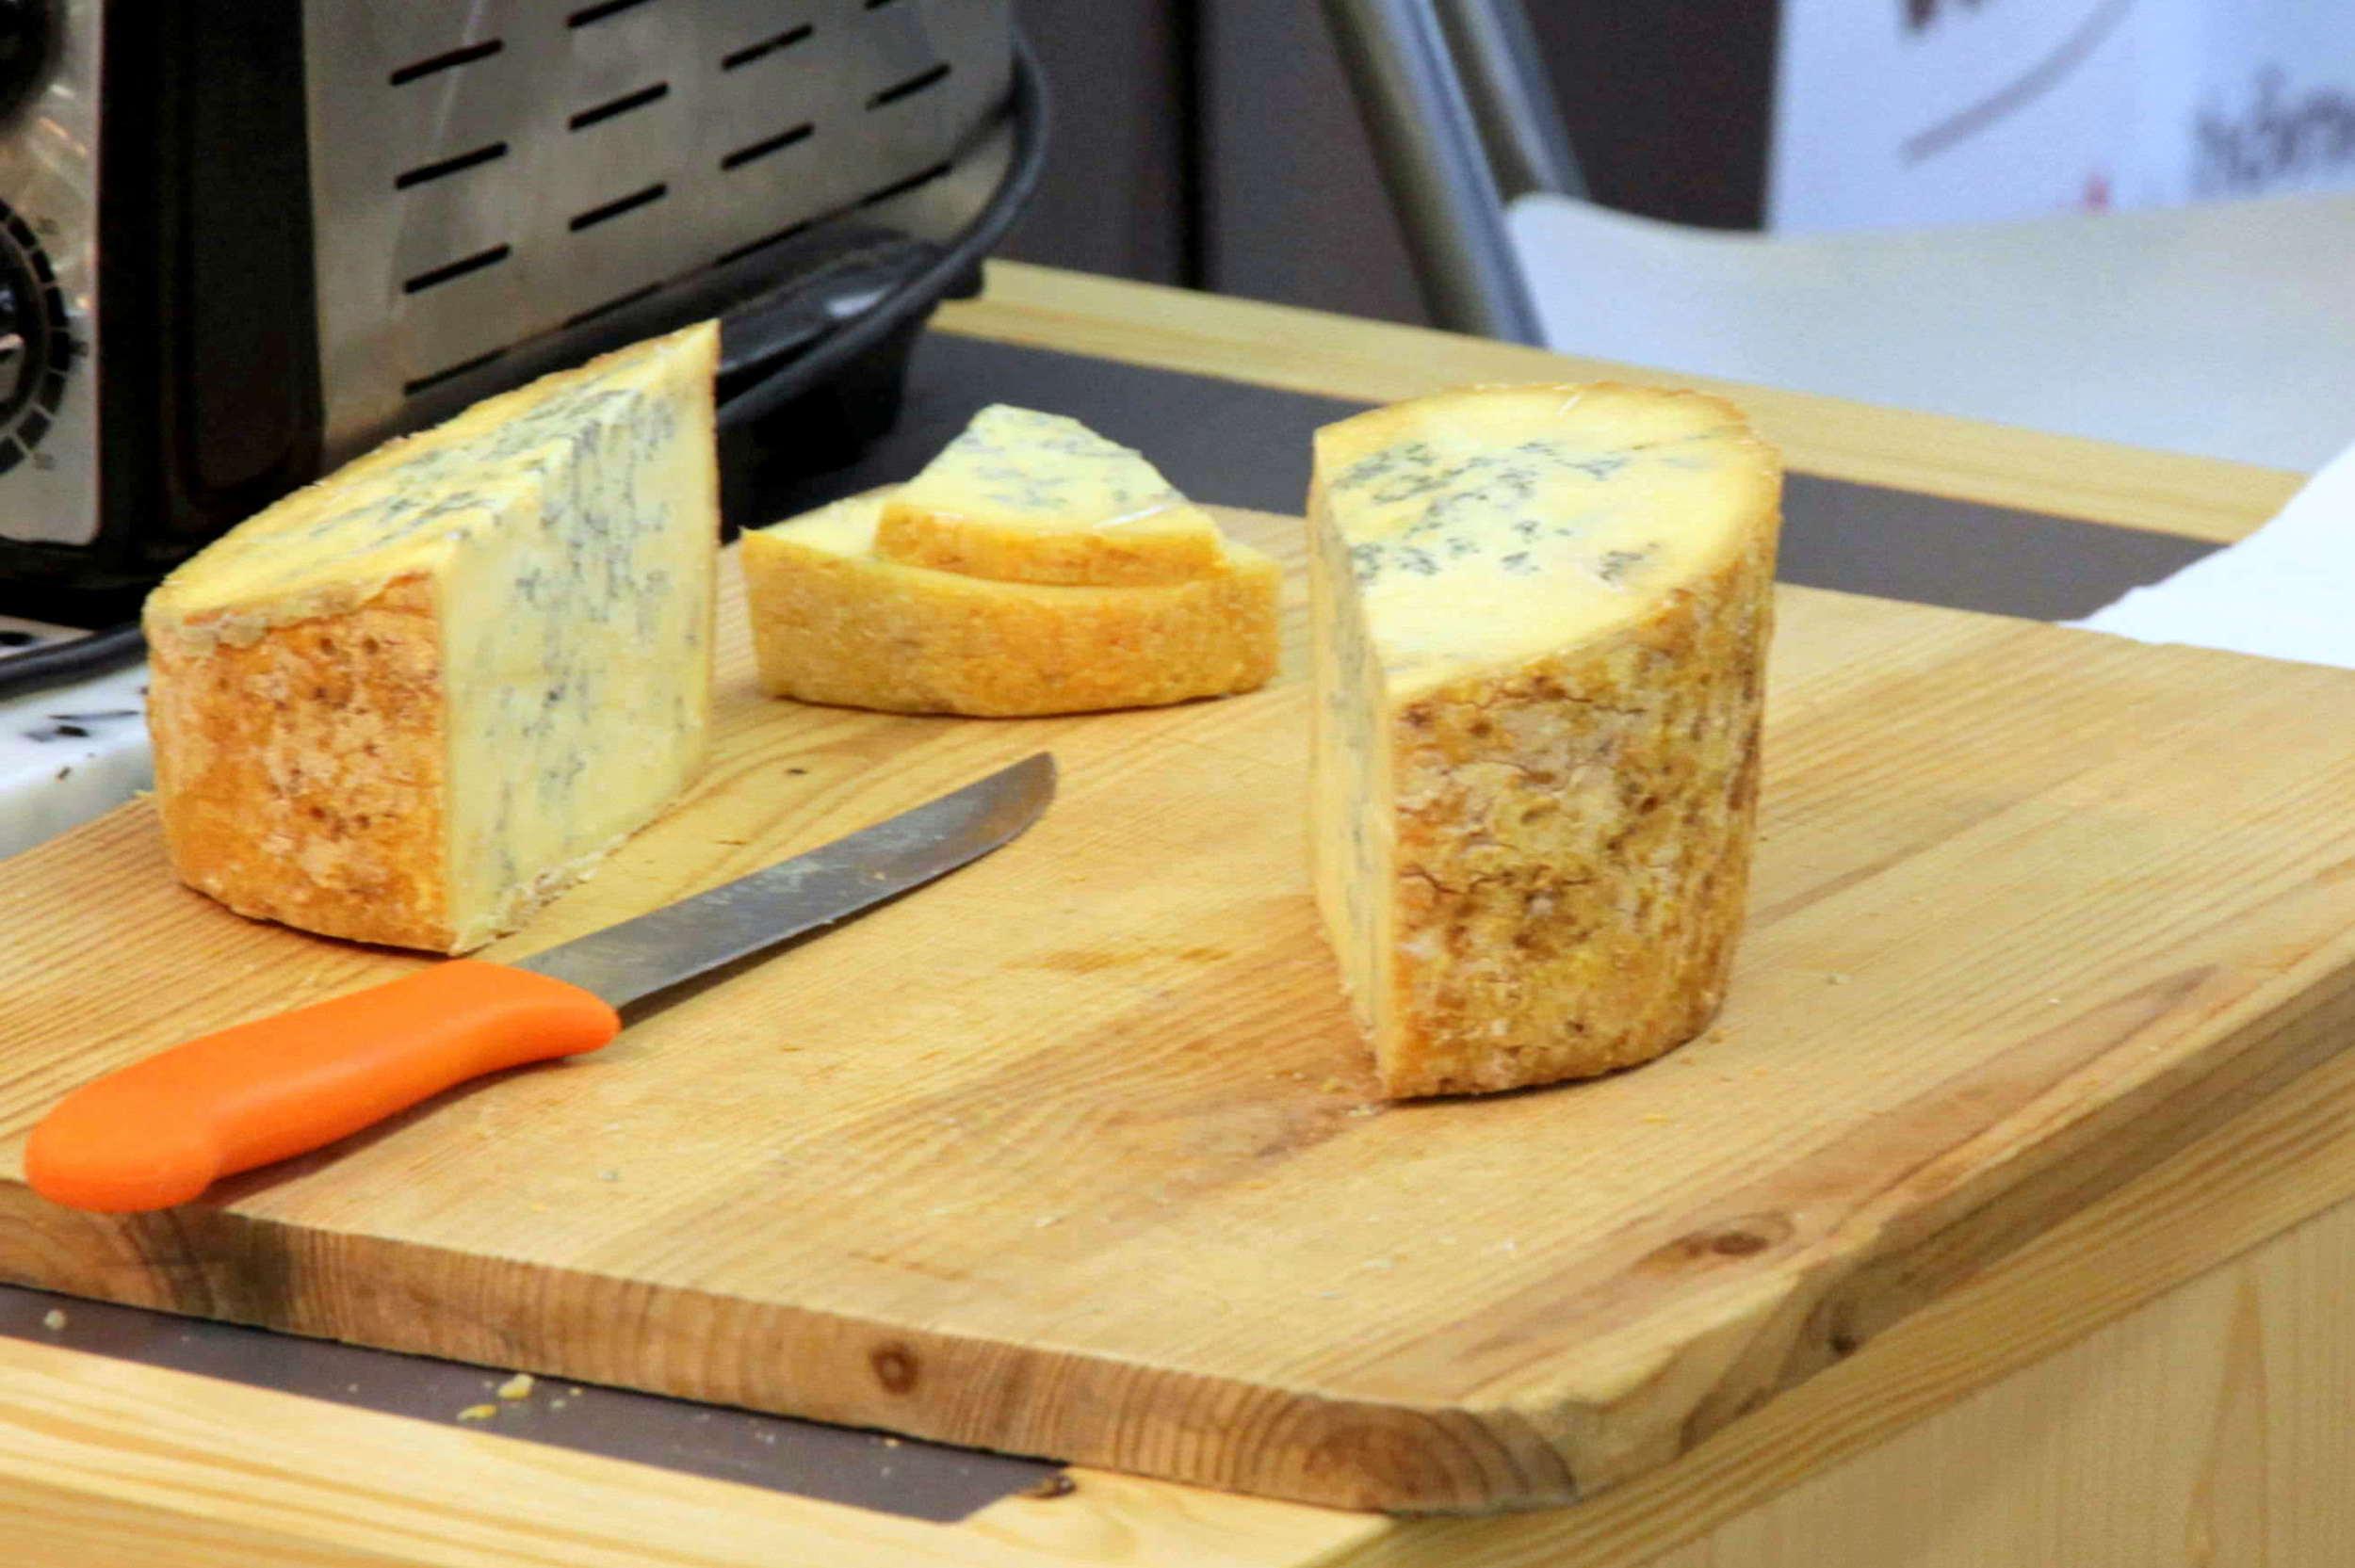 Montbrison has an orange rind & is a bit drier than Fourme d'Ambert